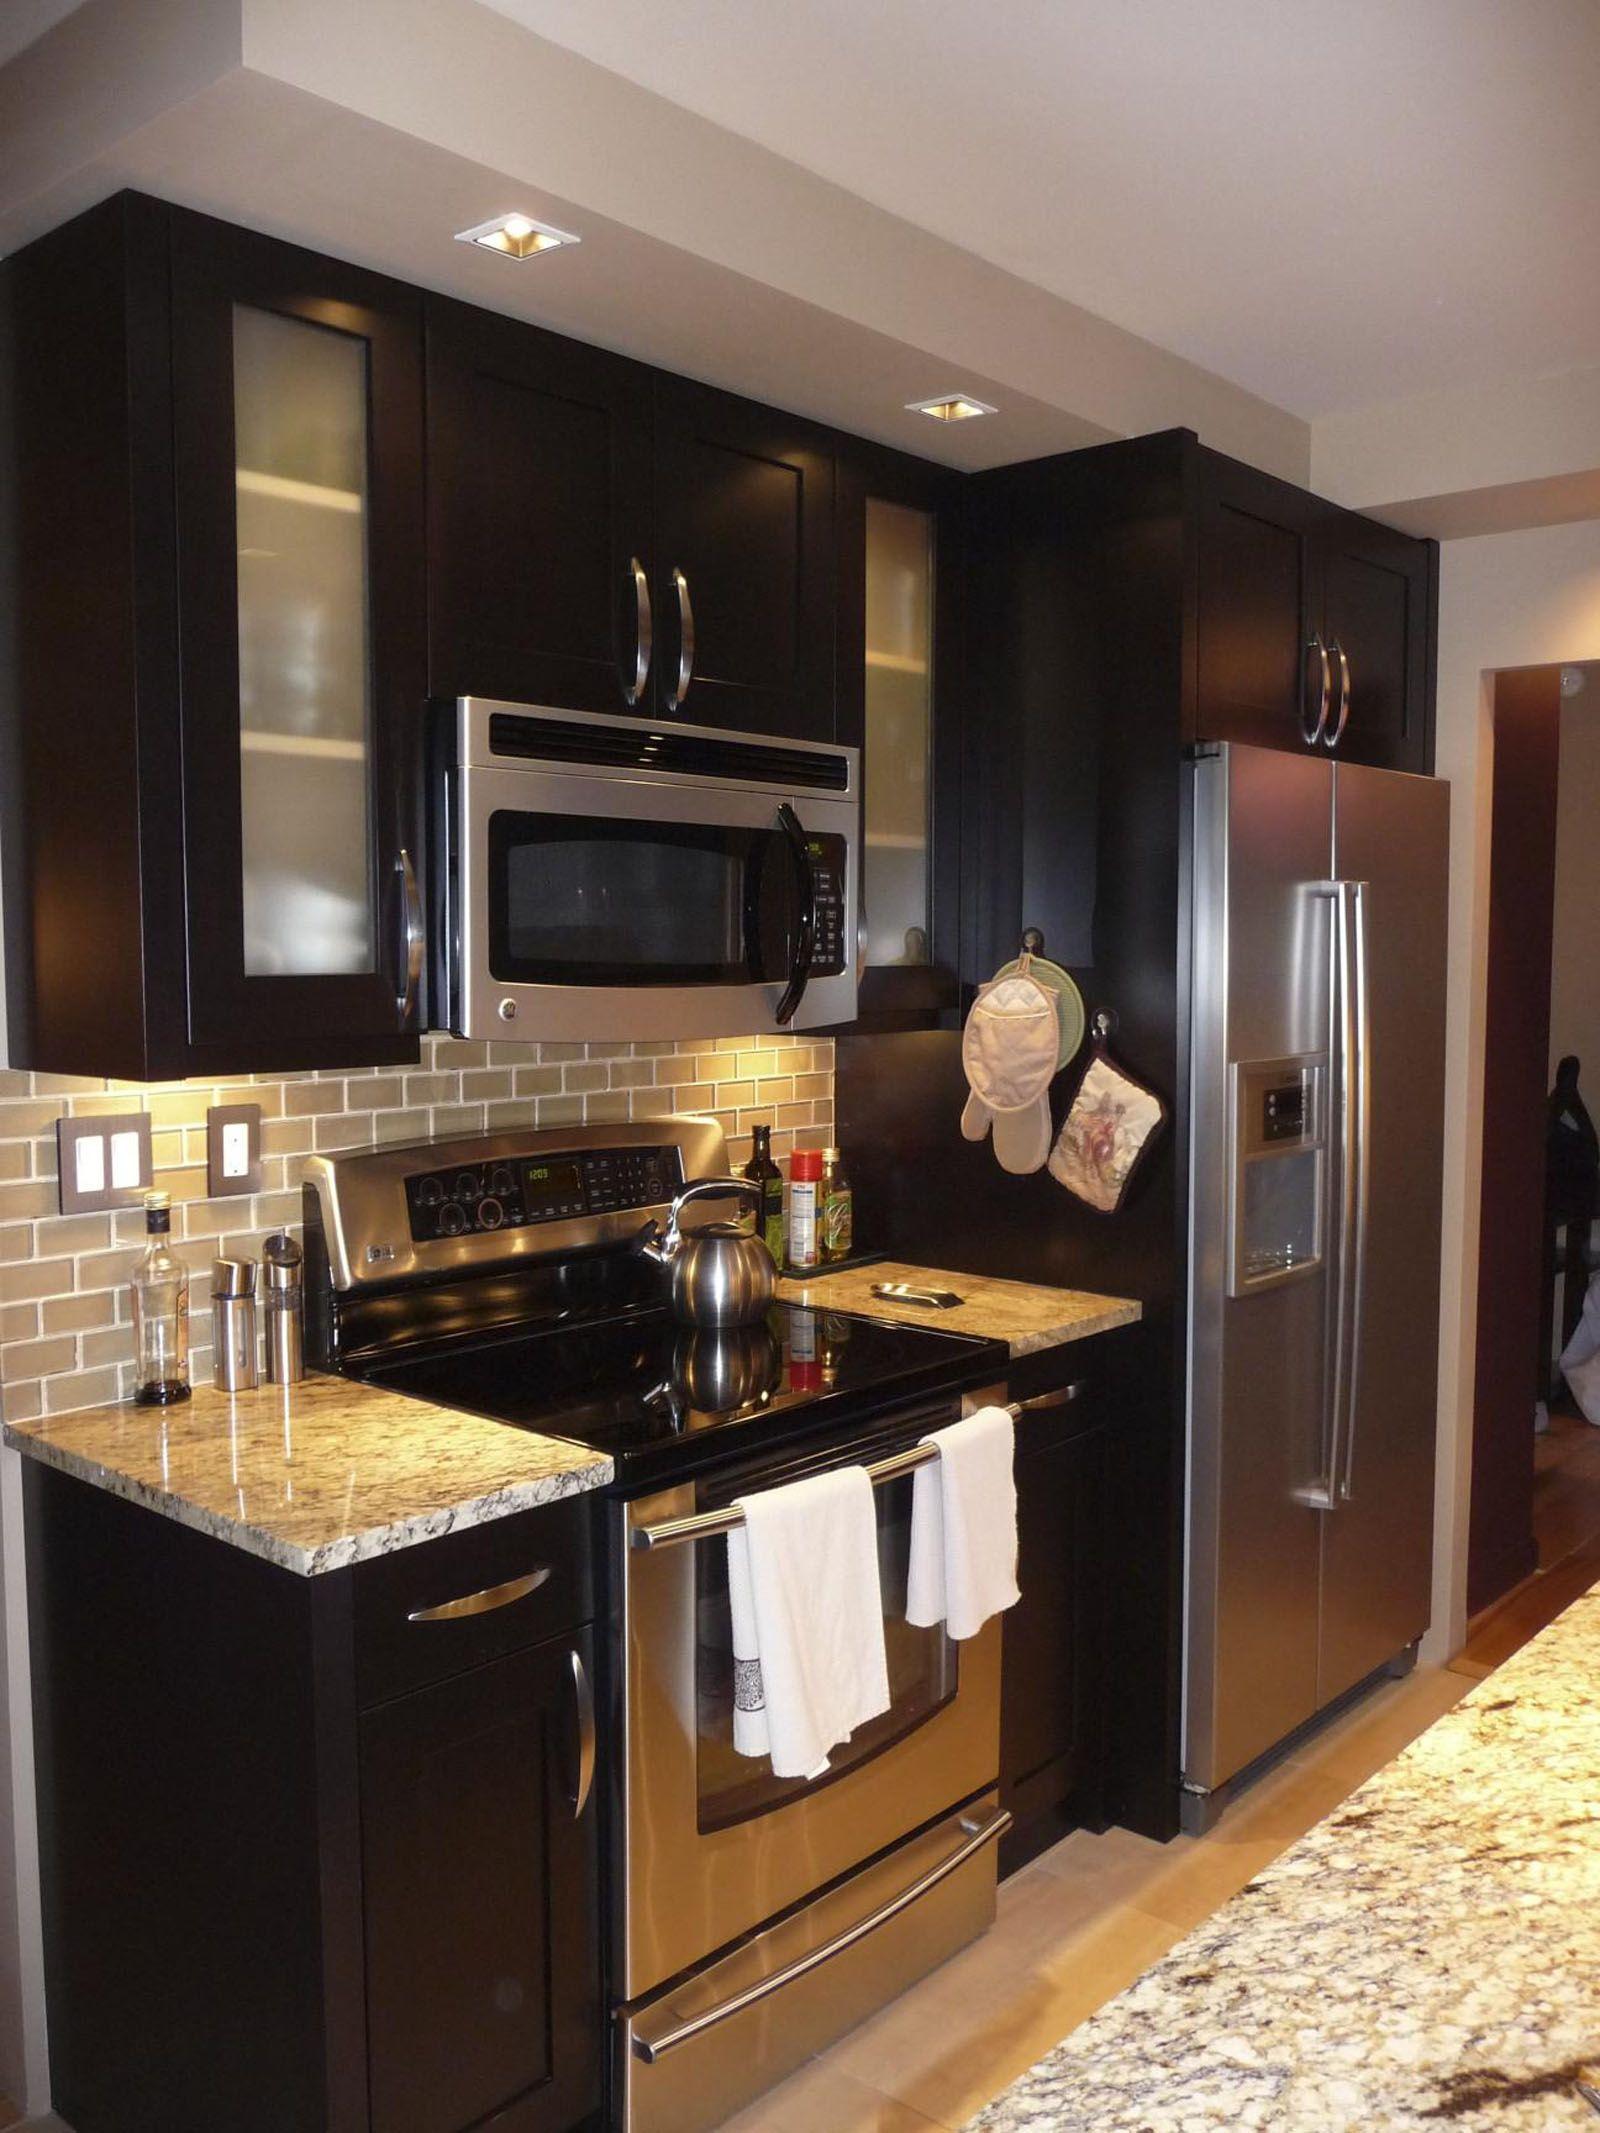 Small U Shaped Kitchen With Peninsula Home Decorating Ideas Small Modern Kitchens Kitchen Design Small Modern Kitchen Design